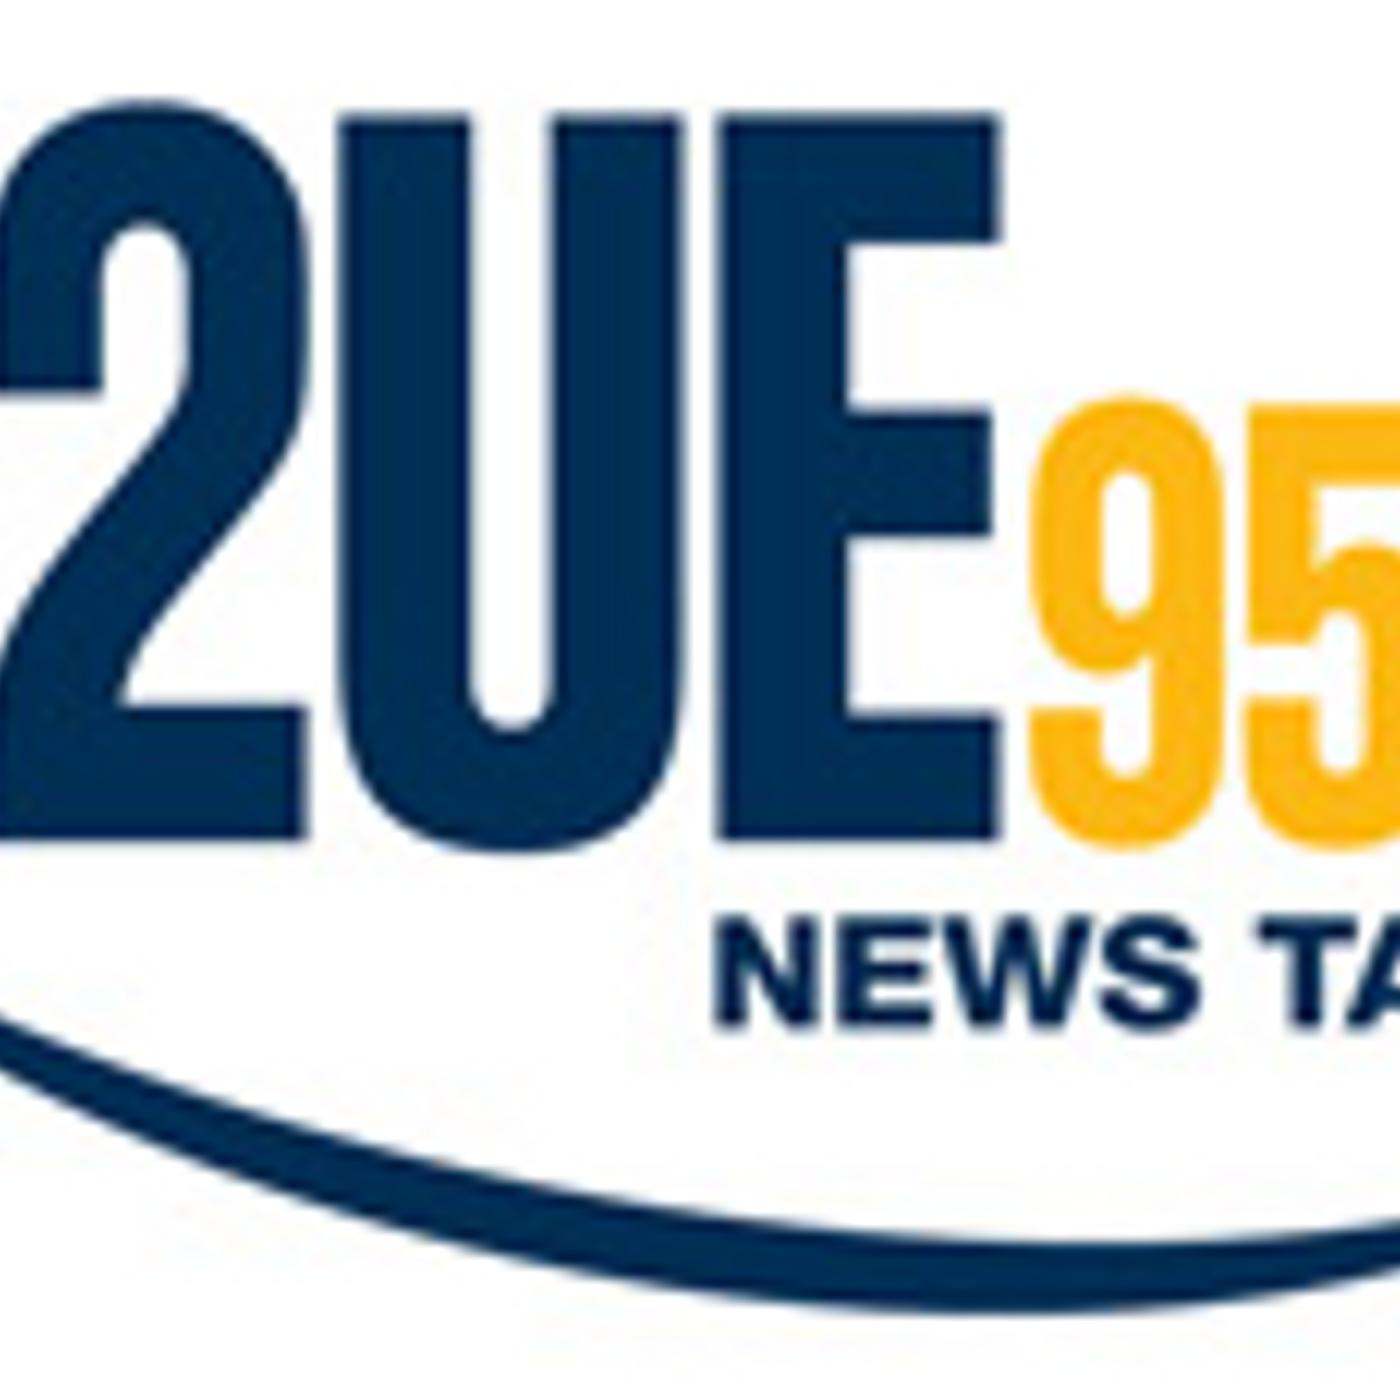 Pwfm1u1tuzbjtmnvt6fw radio 2ue logo